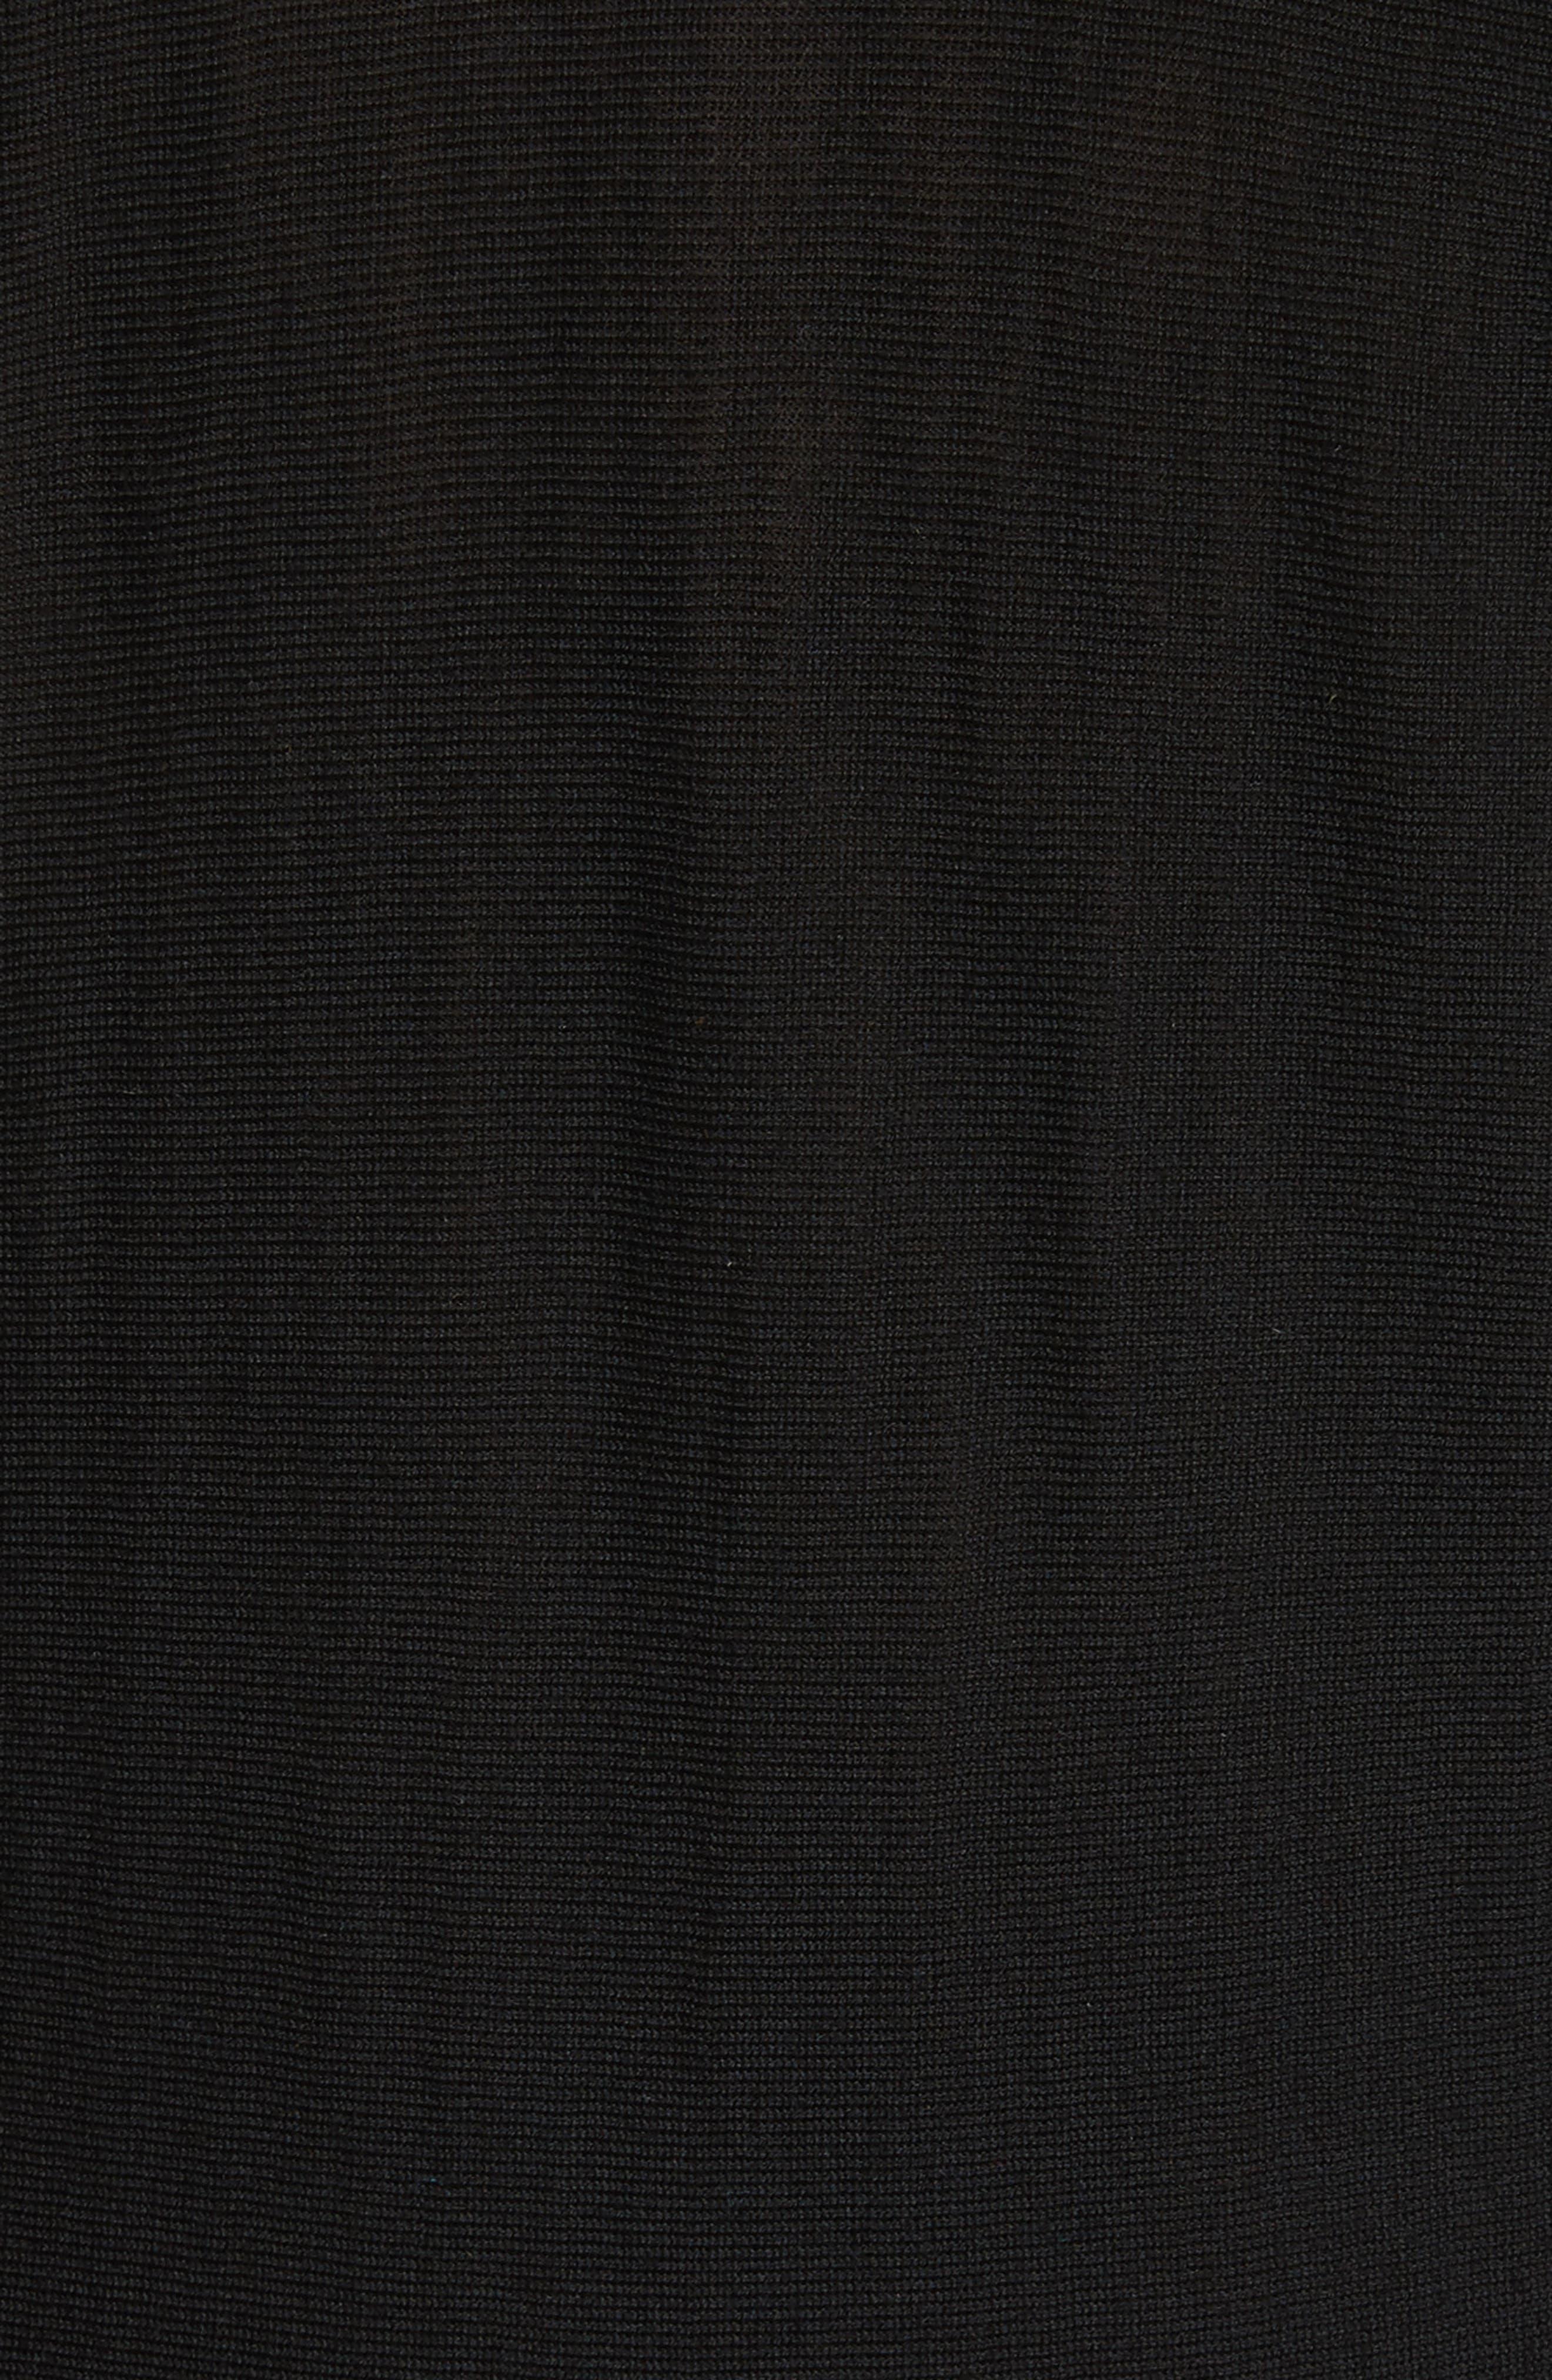 Merino Wool Blend Dolman Sweater,                             Alternate thumbnail 5, color,                             001